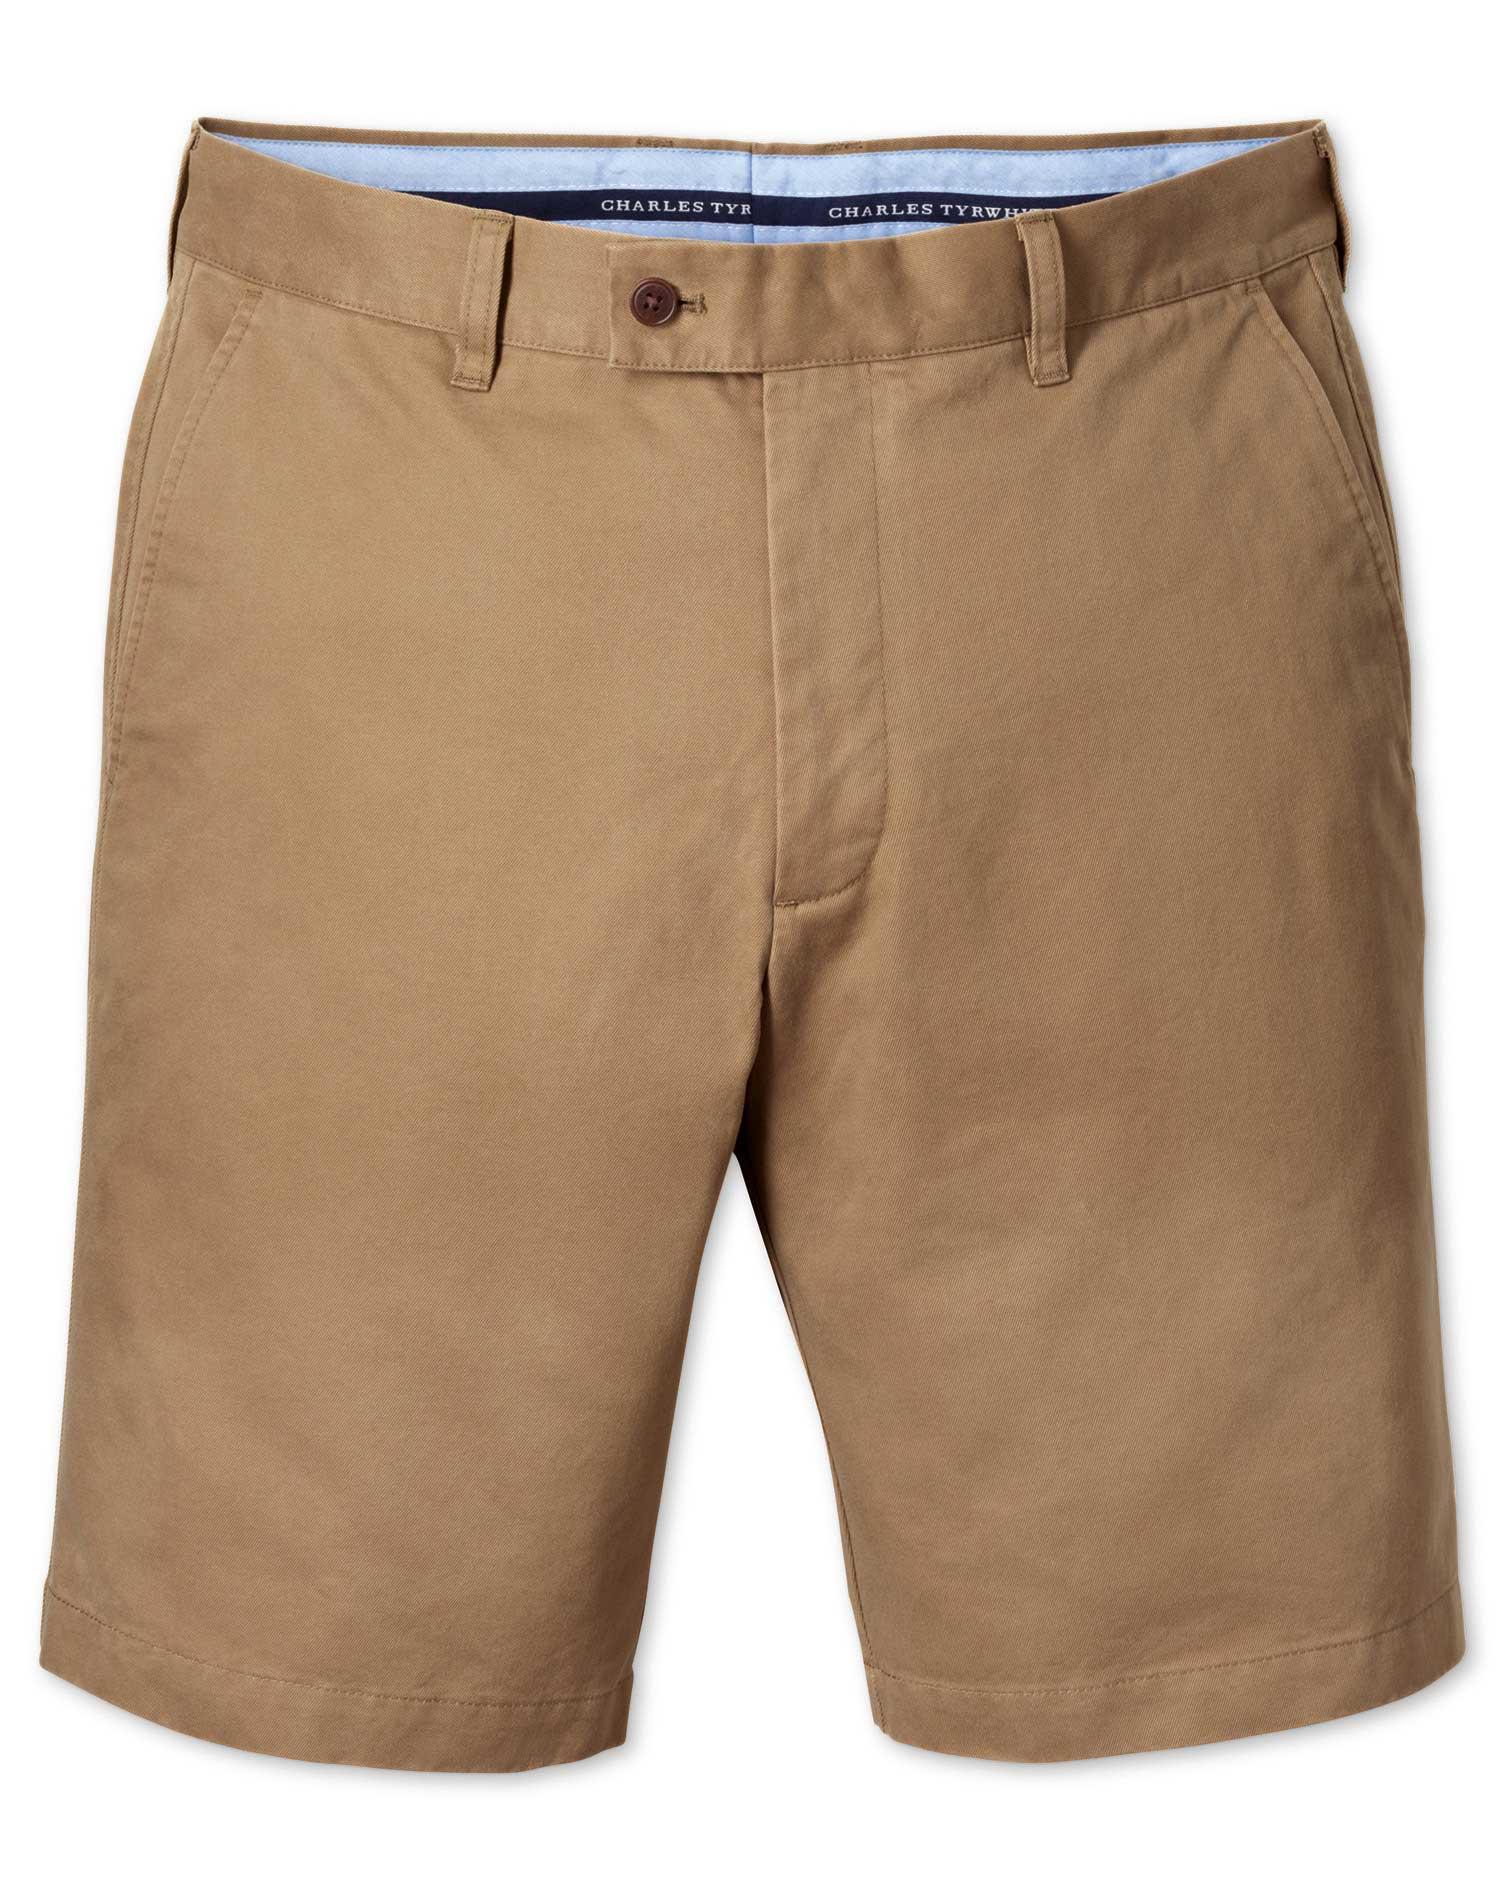 Tan Slim Fit Chino Cotton Shorts Size 40 by Charles Tyrwhitt